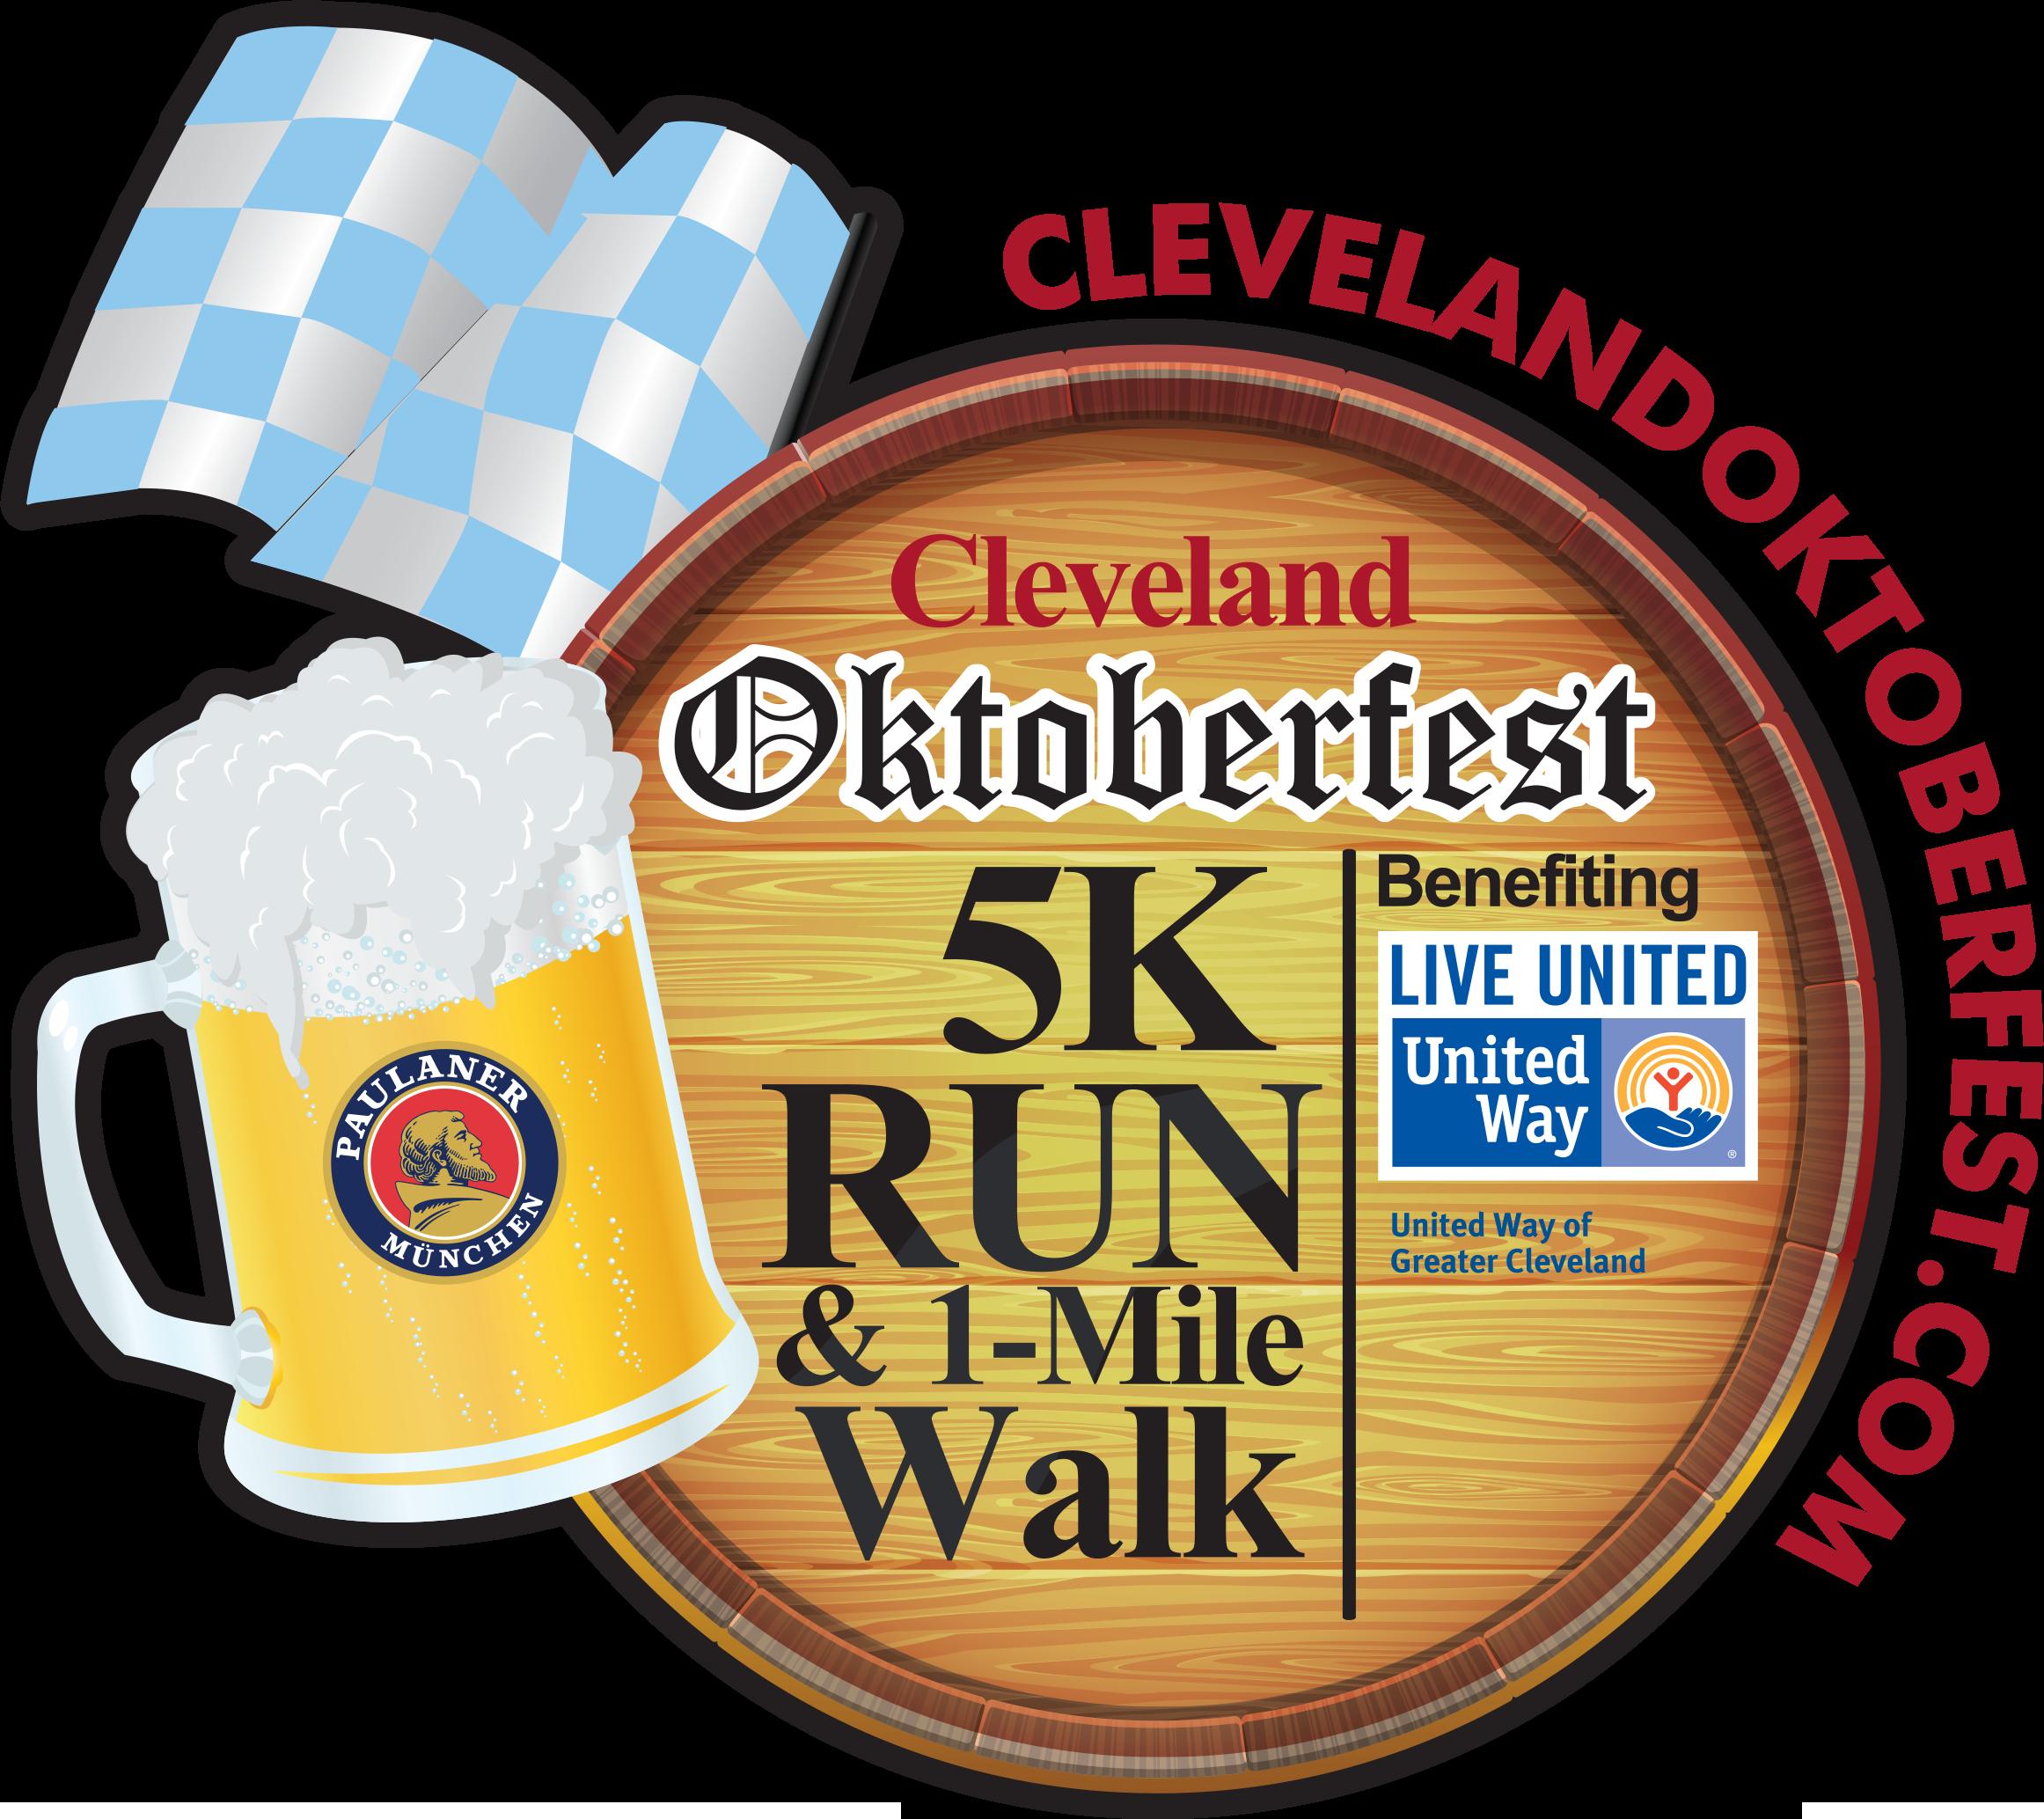 Cleveland Oktoberfest 5K Bier Run - Berea, OH 2019 | ACTIVE